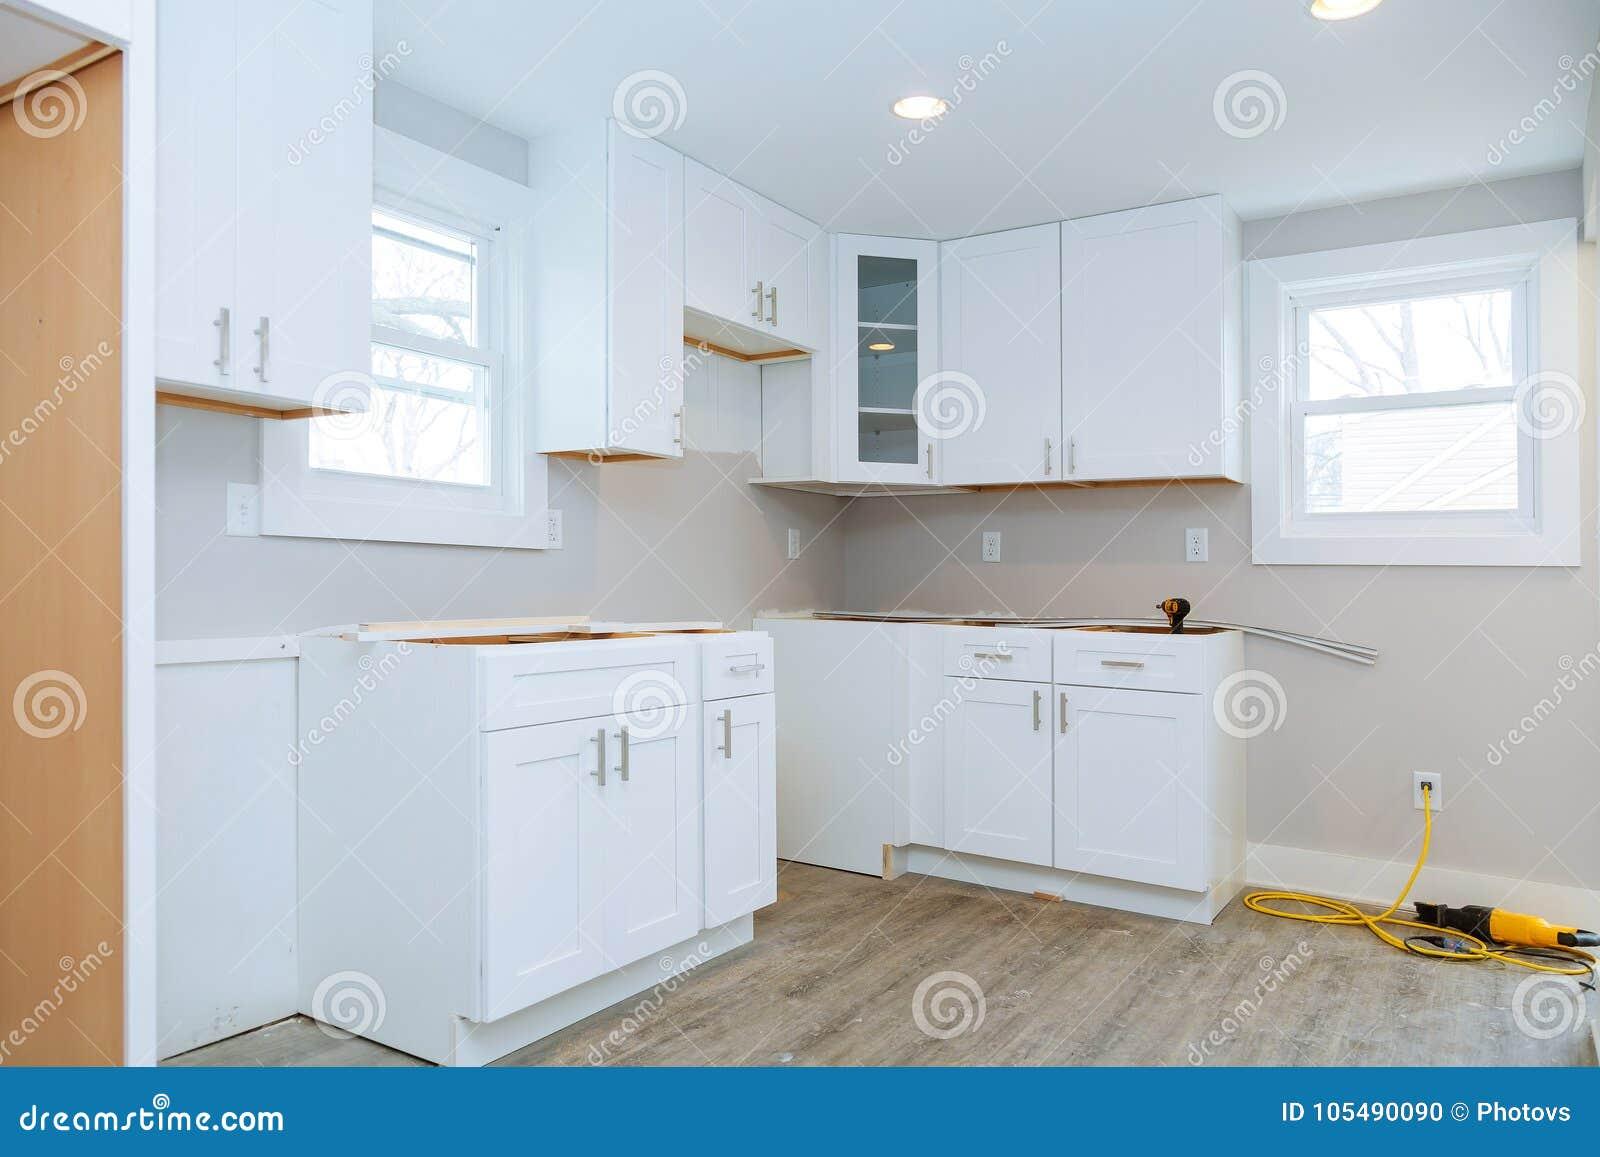 instal kitchen cabinets Interior design construction of a kitchen